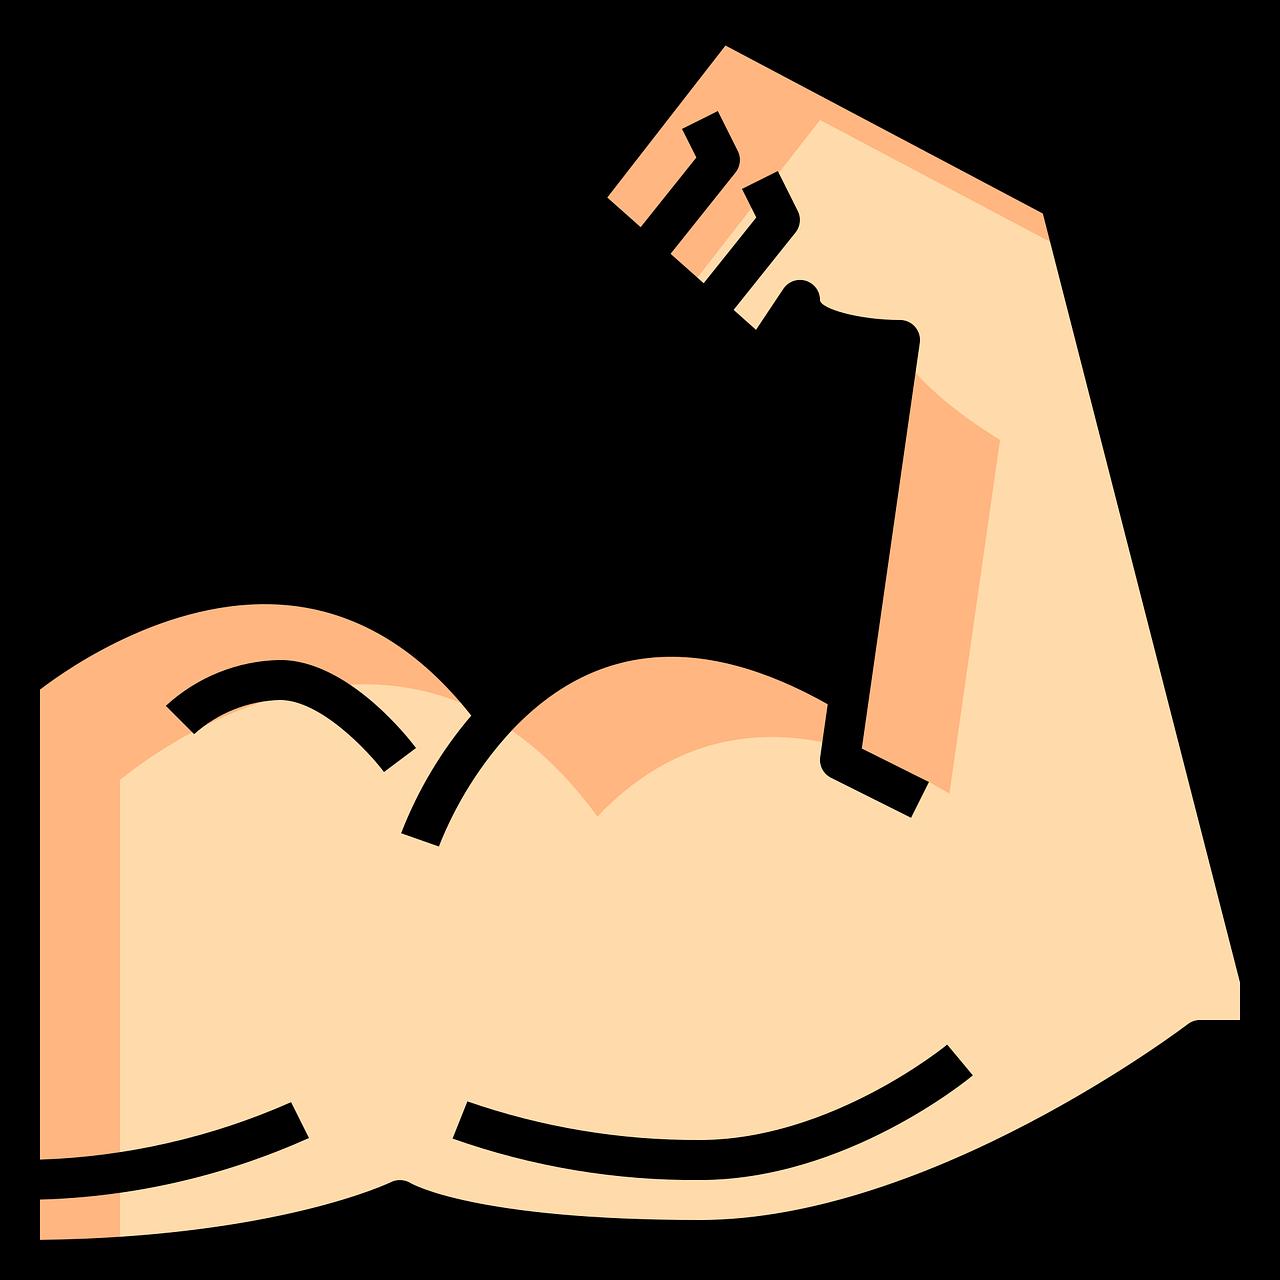 Anhang muscular-5279449_1280.png